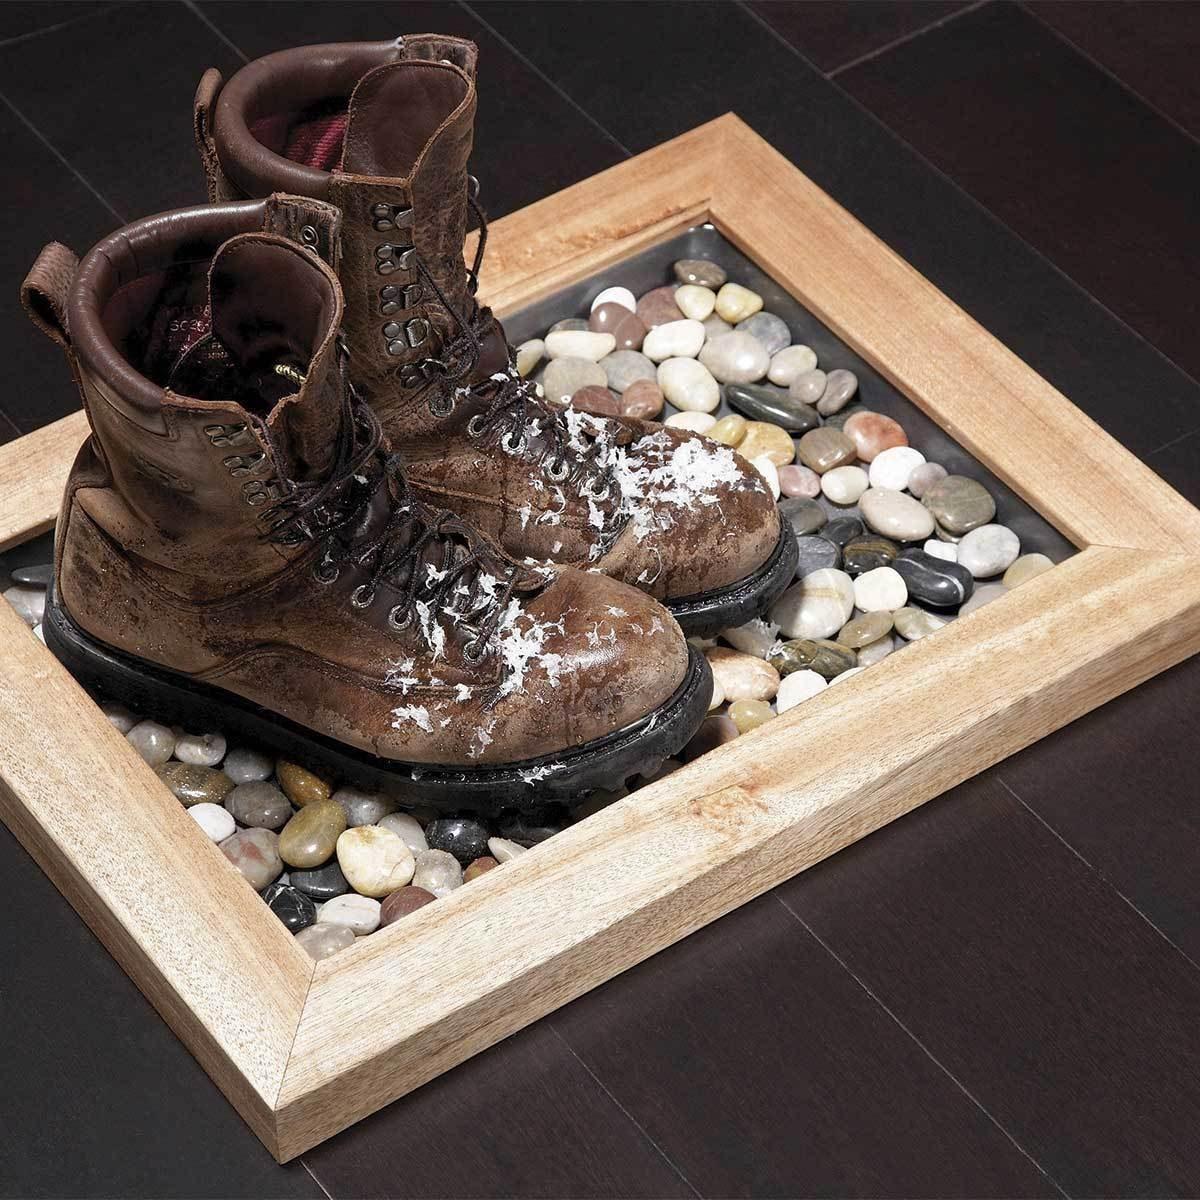 DIY Boot Tray